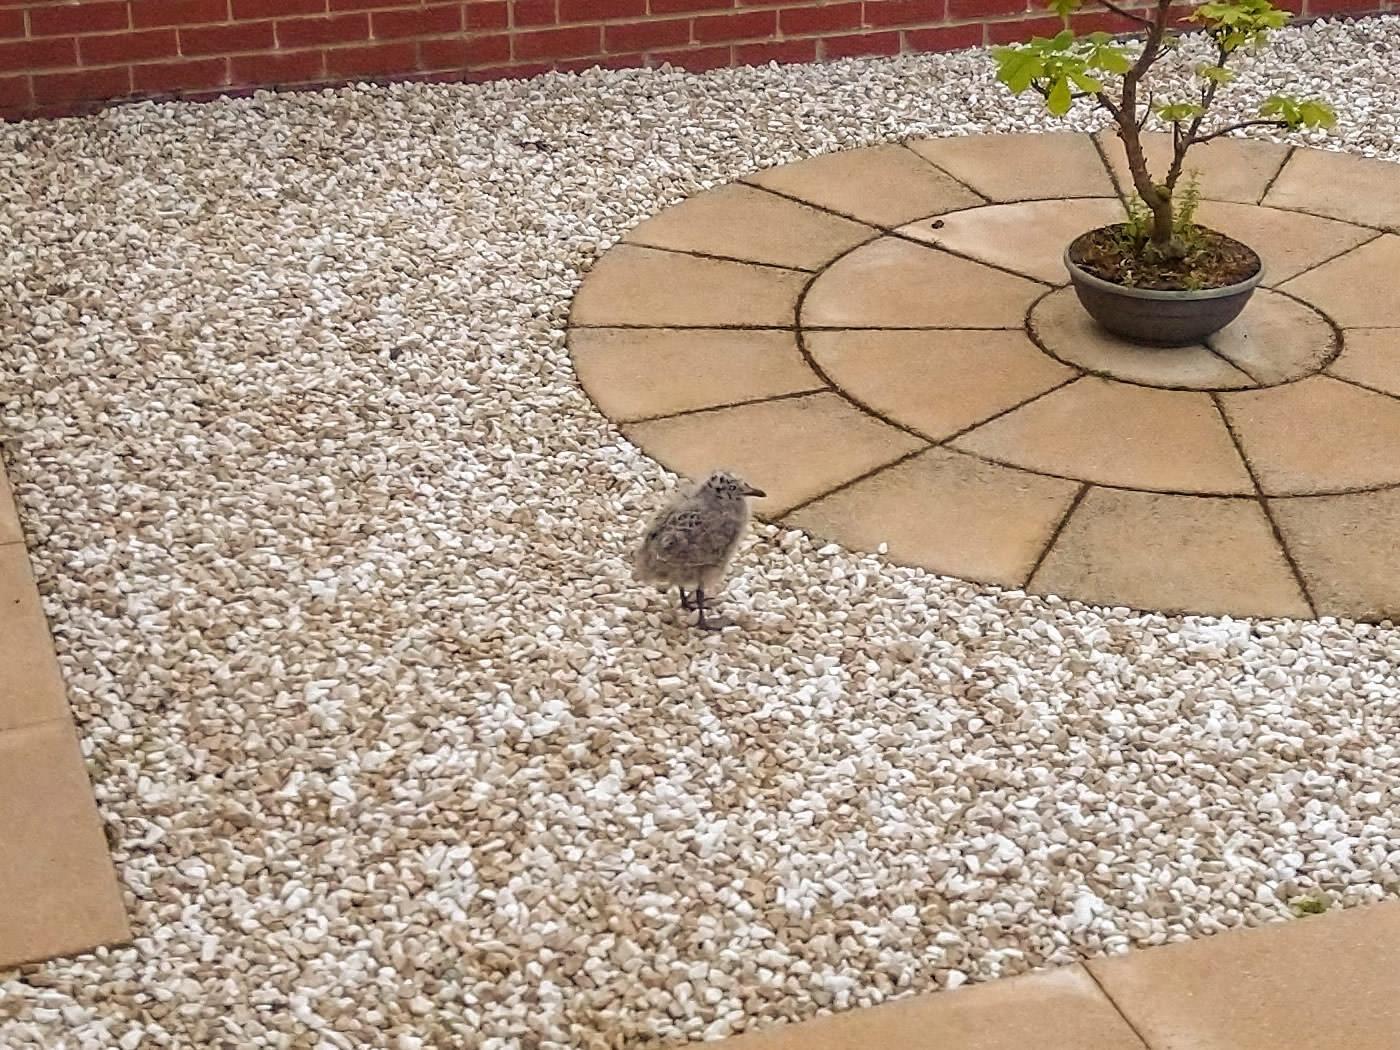 A baby seagull in a garden in Kirkmichael